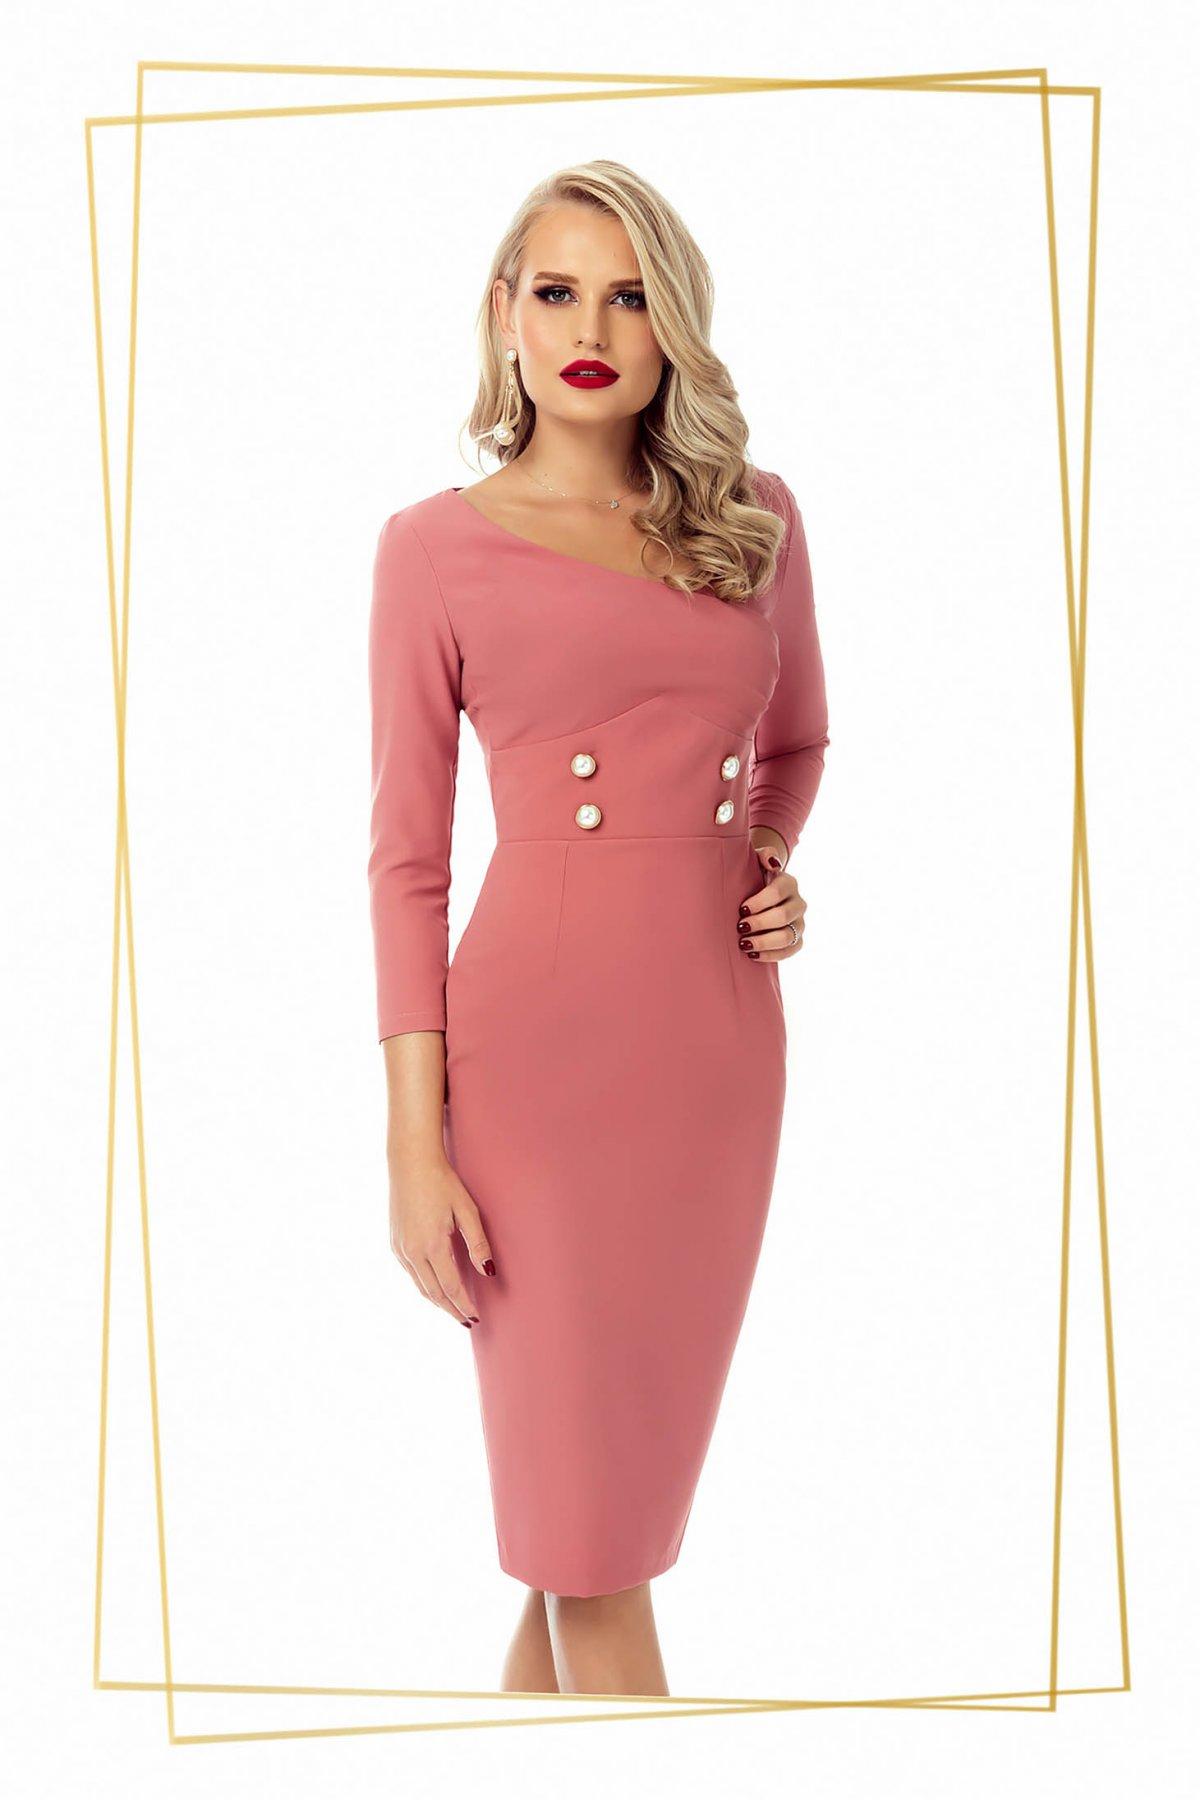 Rochie PrettyGirl roz prafuit office midi tip creion din stofa usor elastica accesorizata cu nasturi PrettyGirl